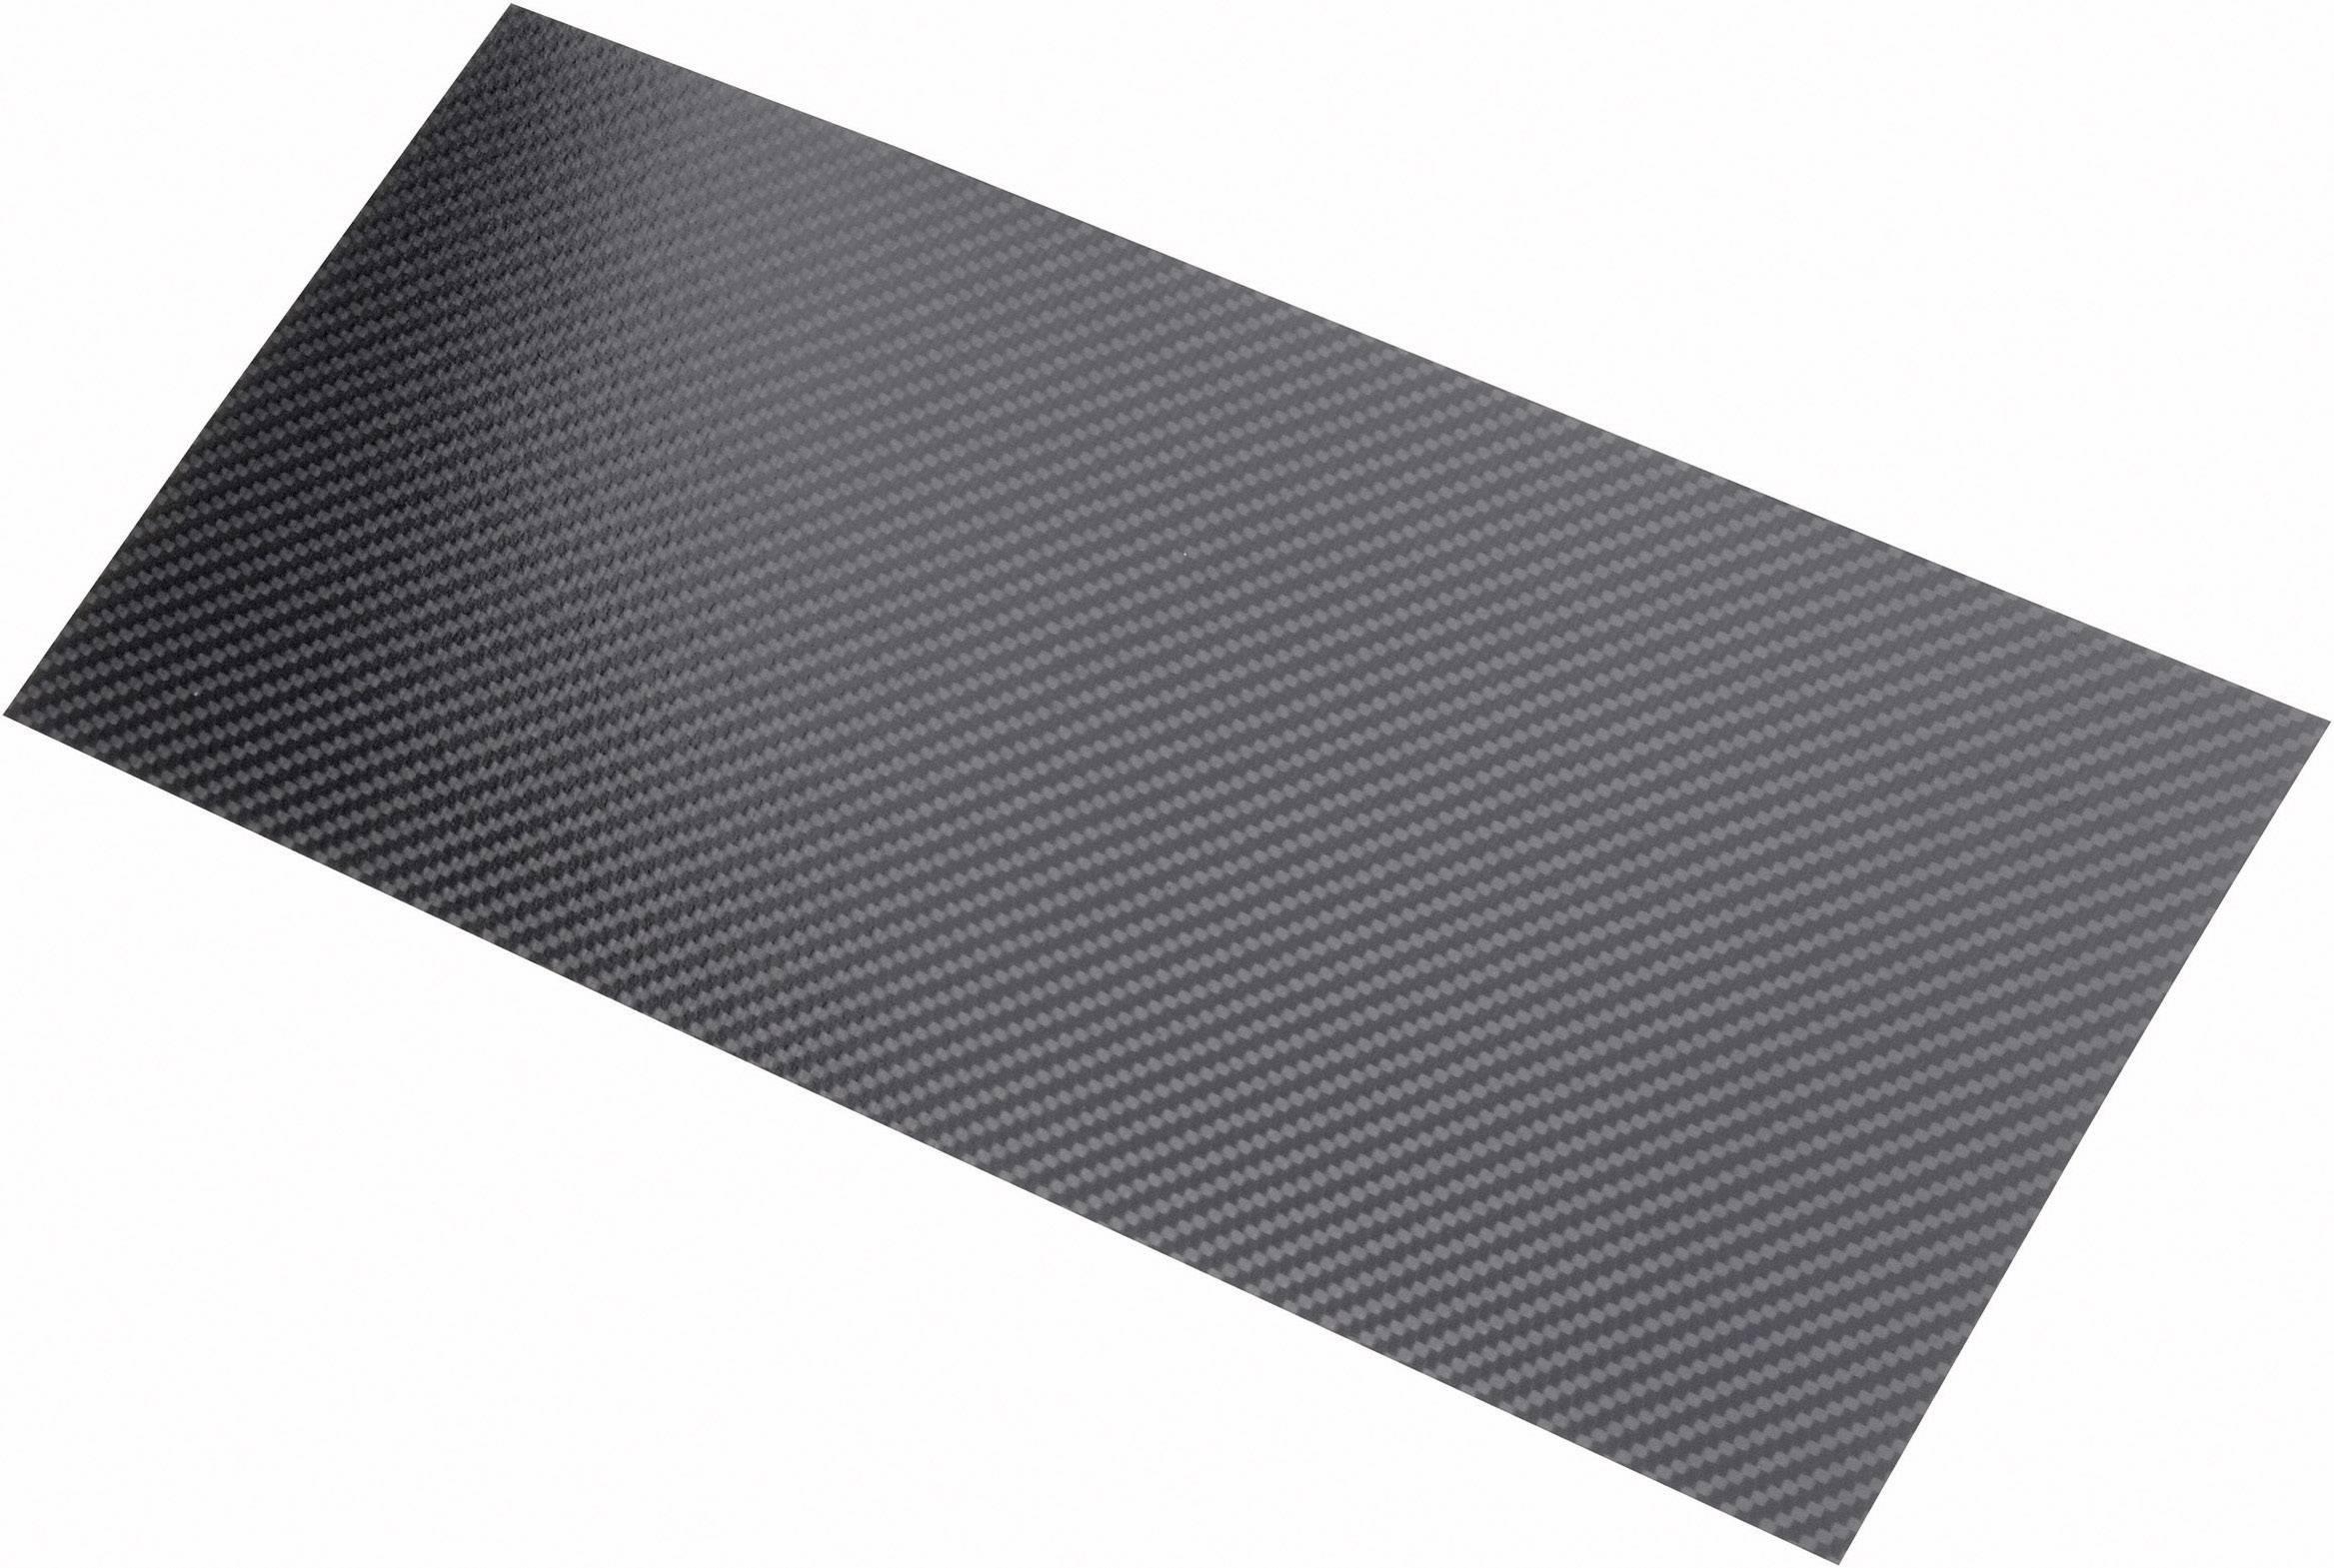 Karbonová deska Carbotec 231663, (d x š) 340 mm x 150 mm x 0.30 mm